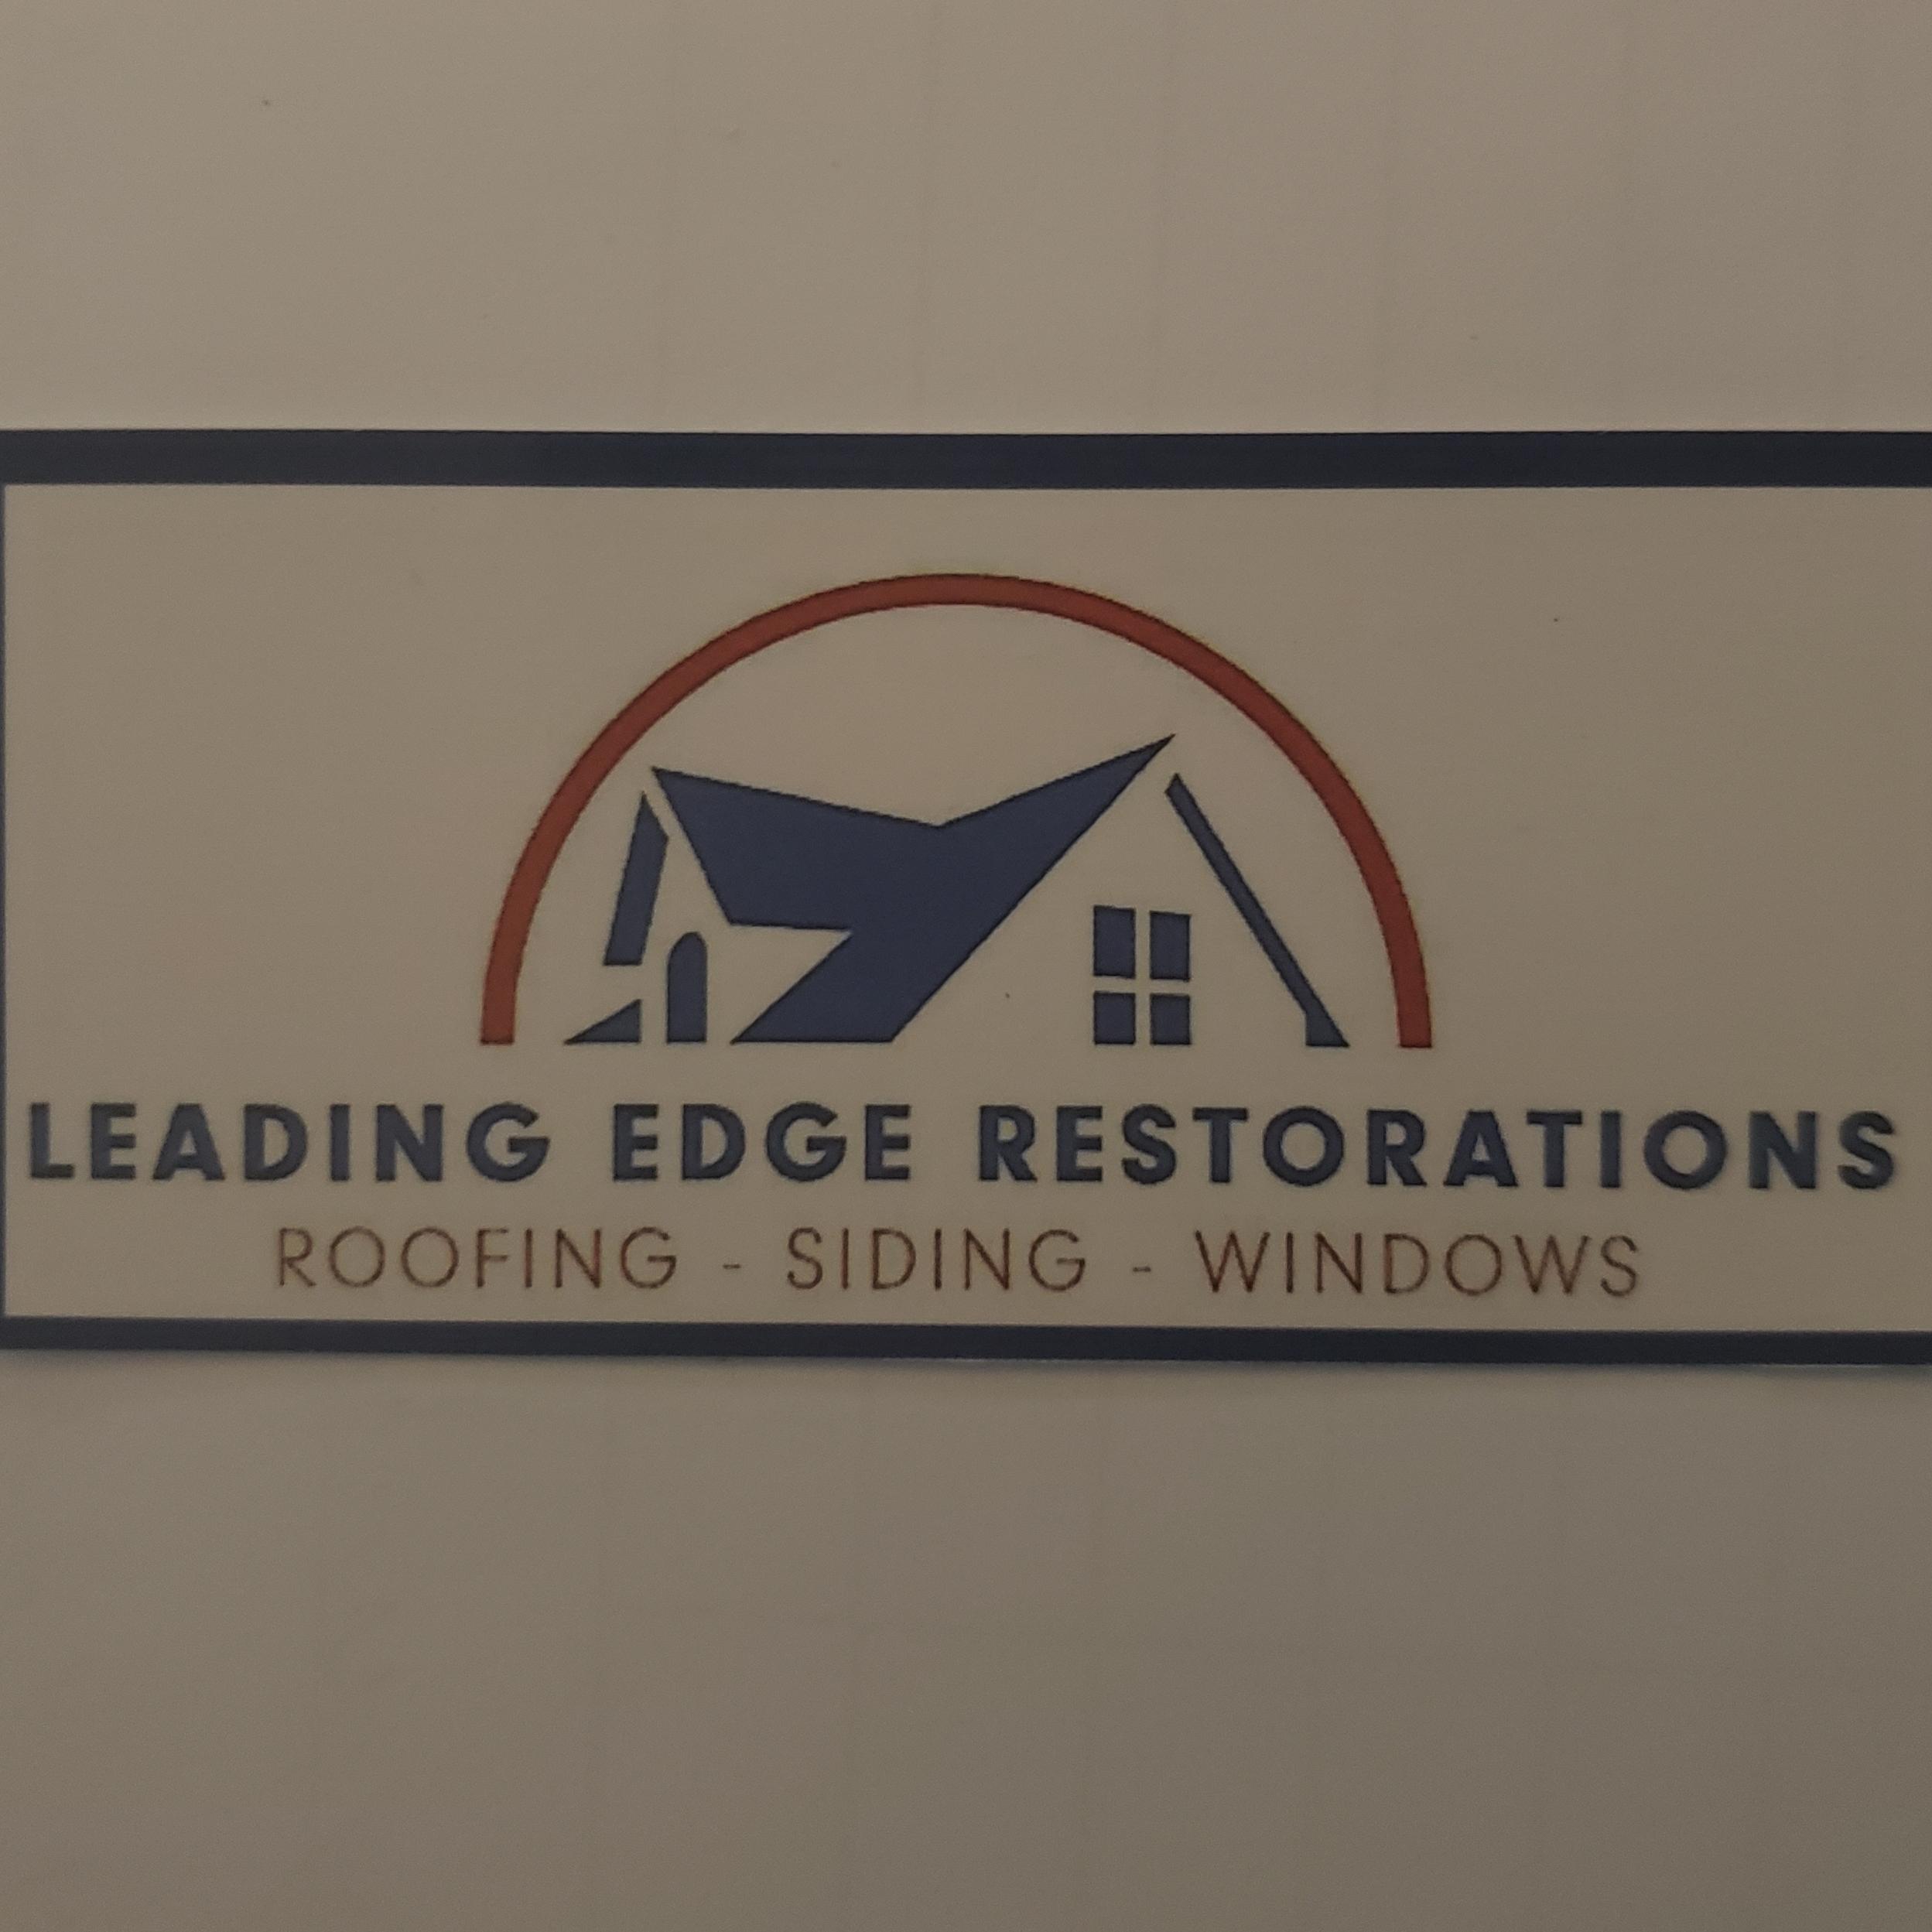 Leading Edge Restorations logo